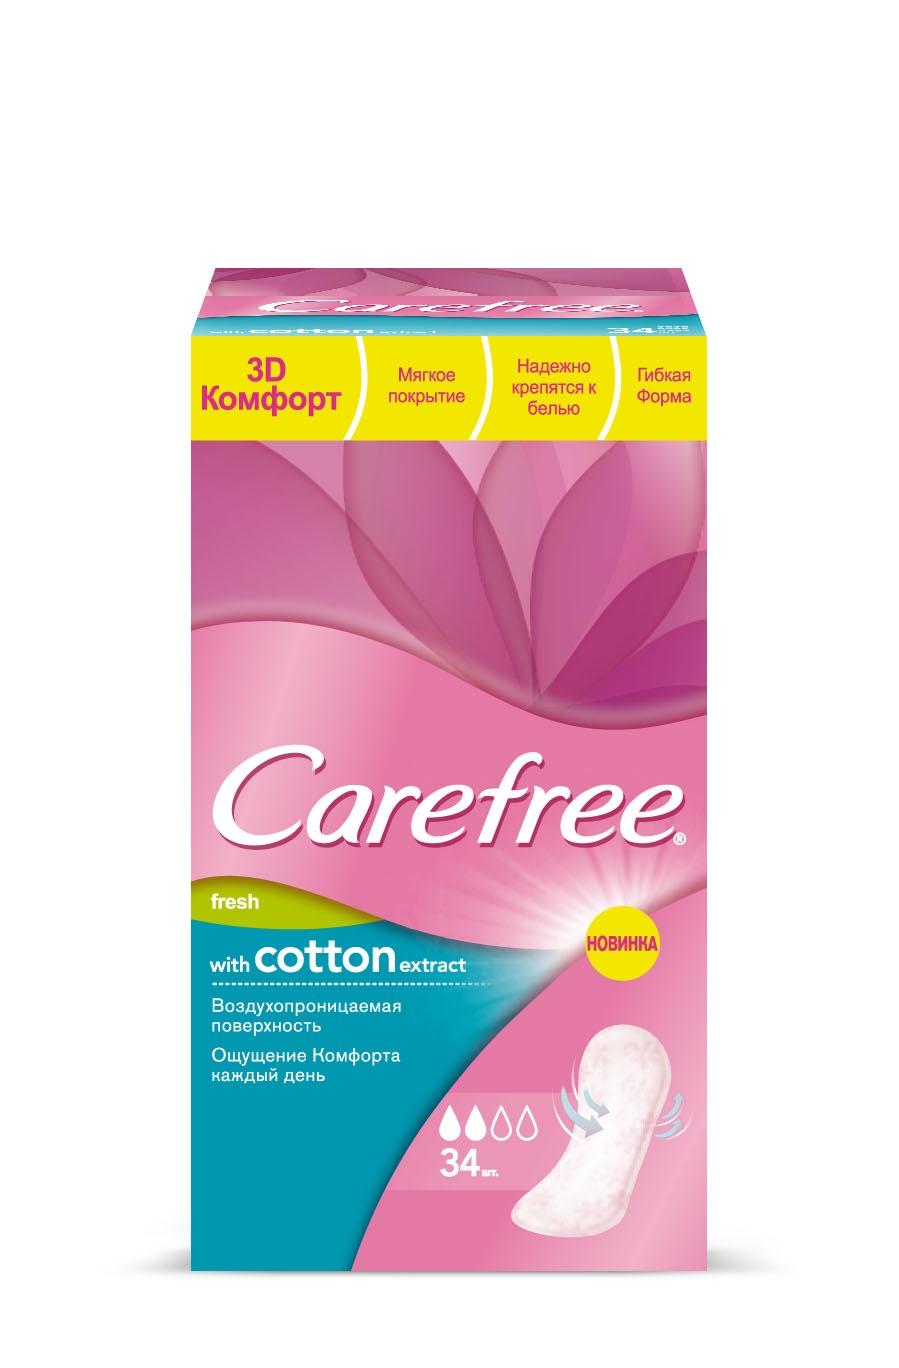 Ежедневные салфетки Carefree® with Cotton Extract fresh